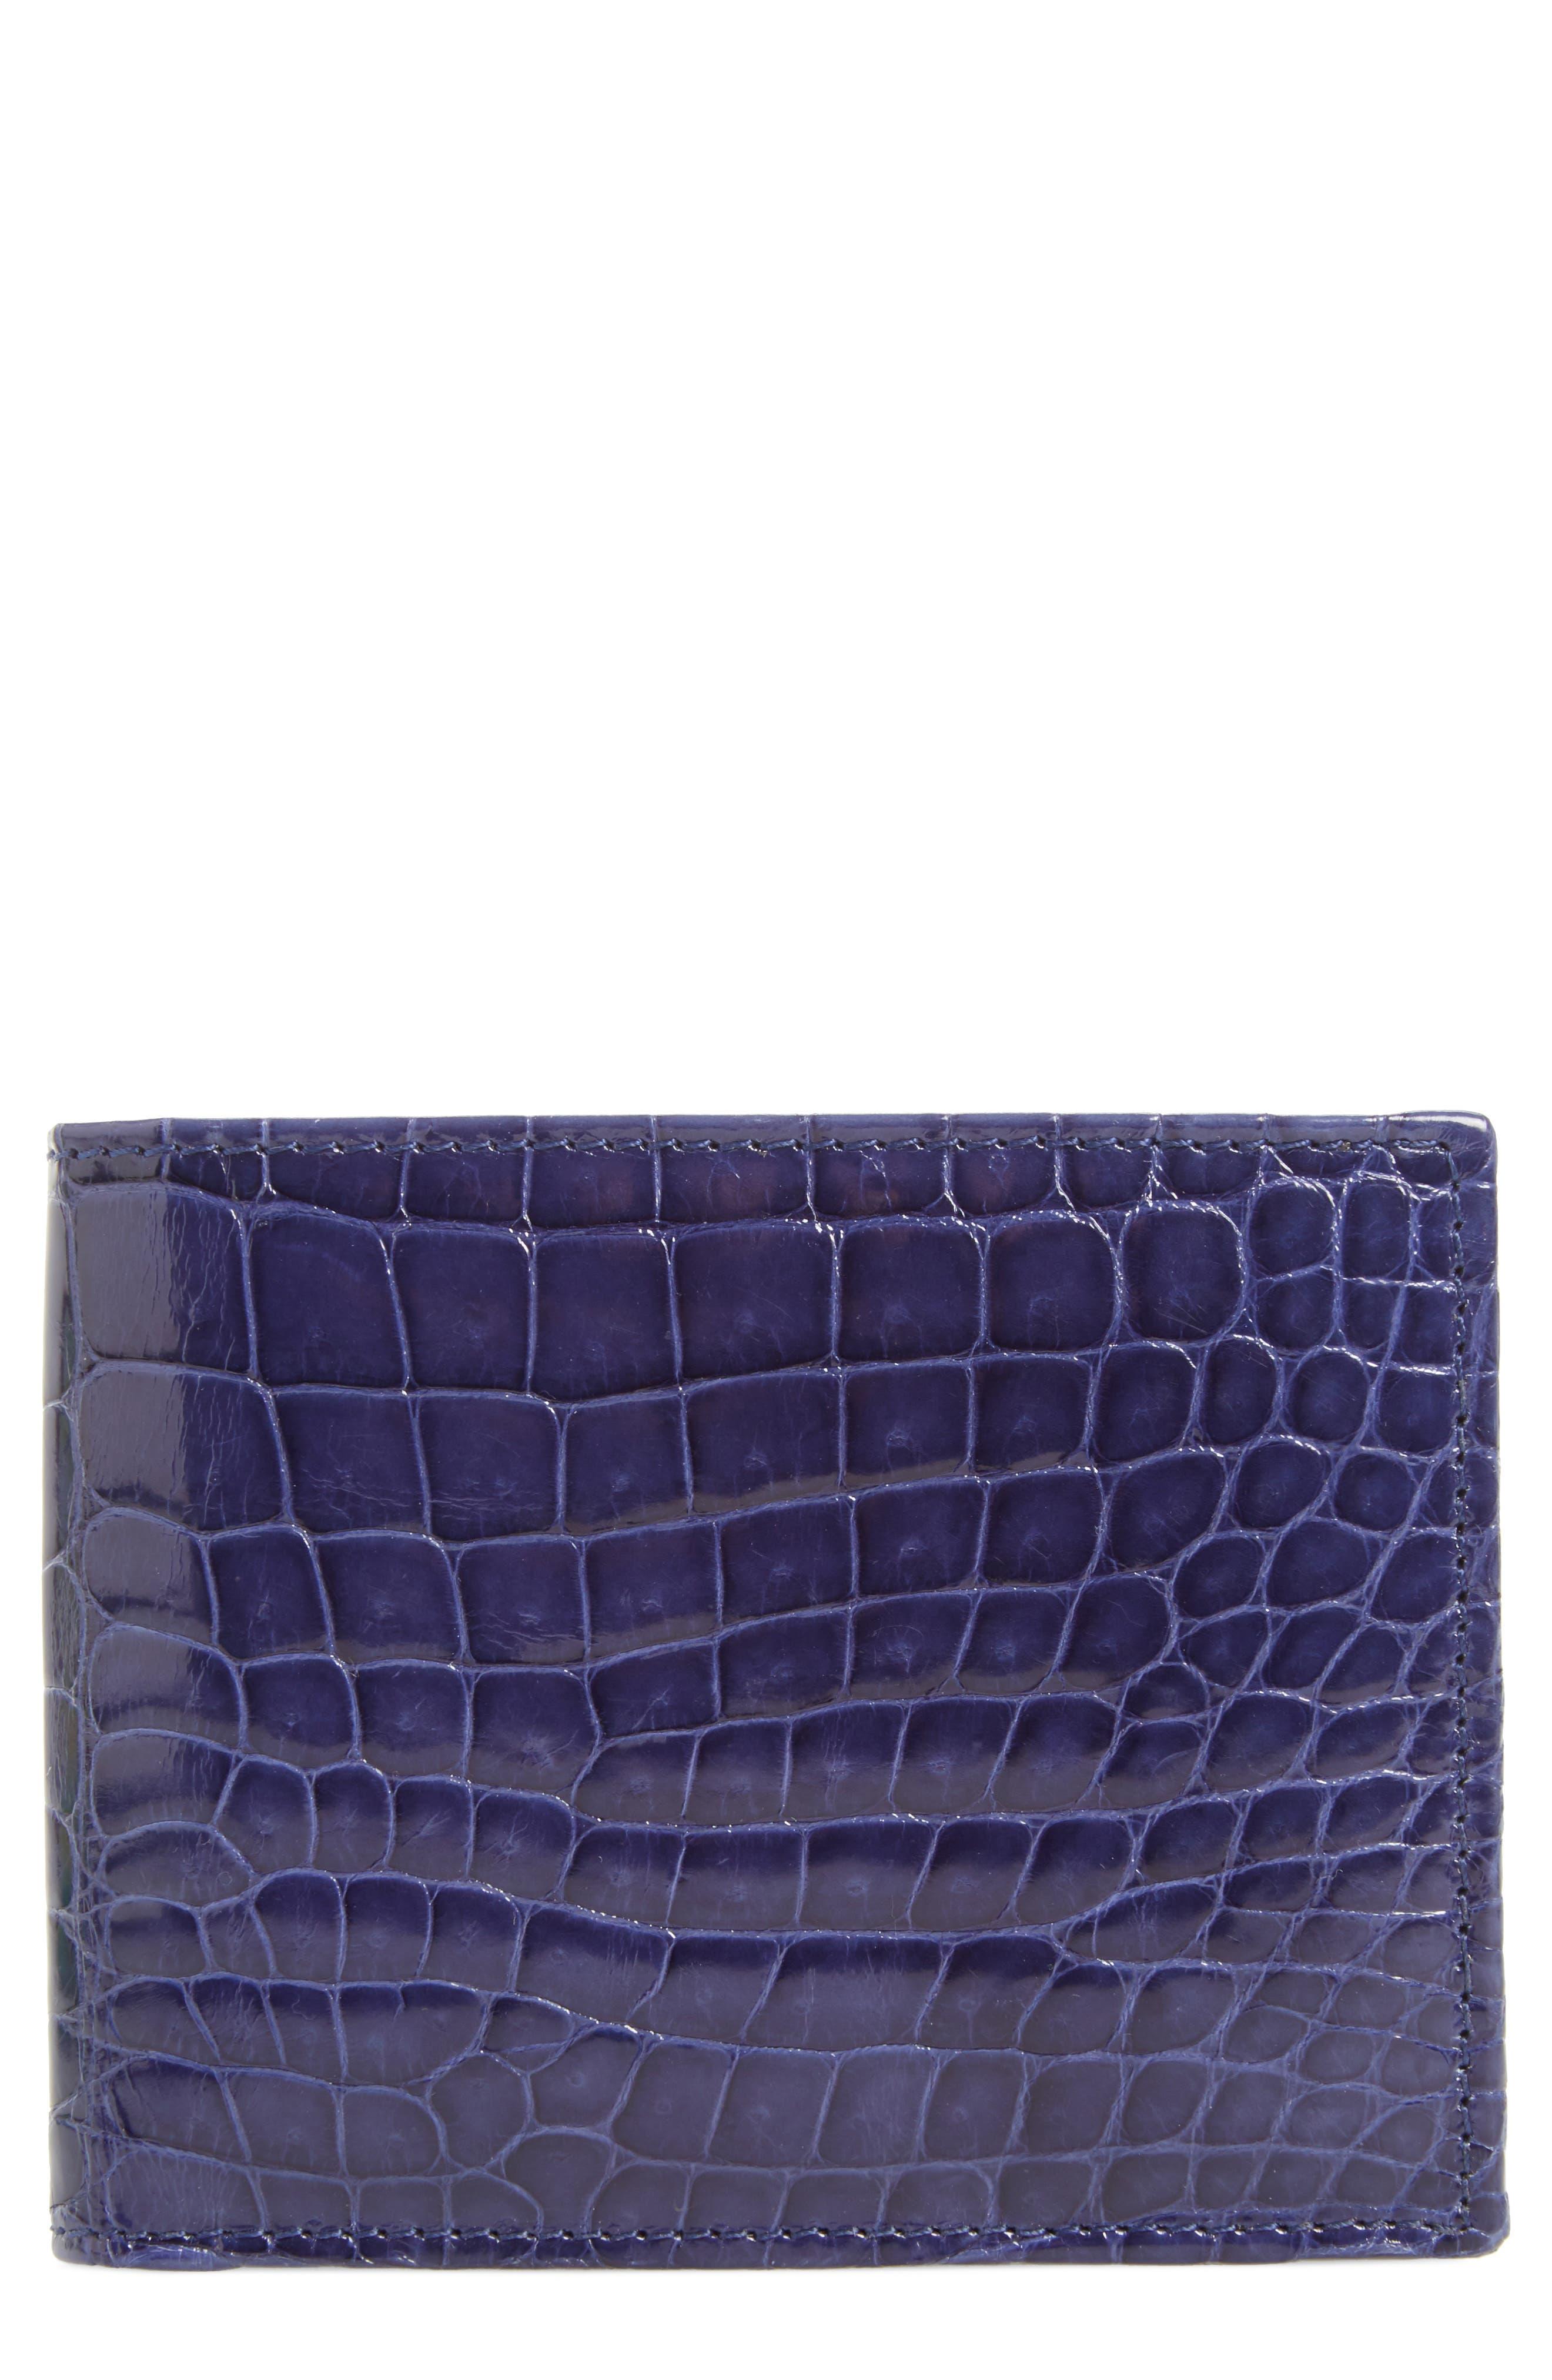 MEZLAN,                             Alligator Leather Bifold Wallet,                             Main thumbnail 1, color,                             JEANS